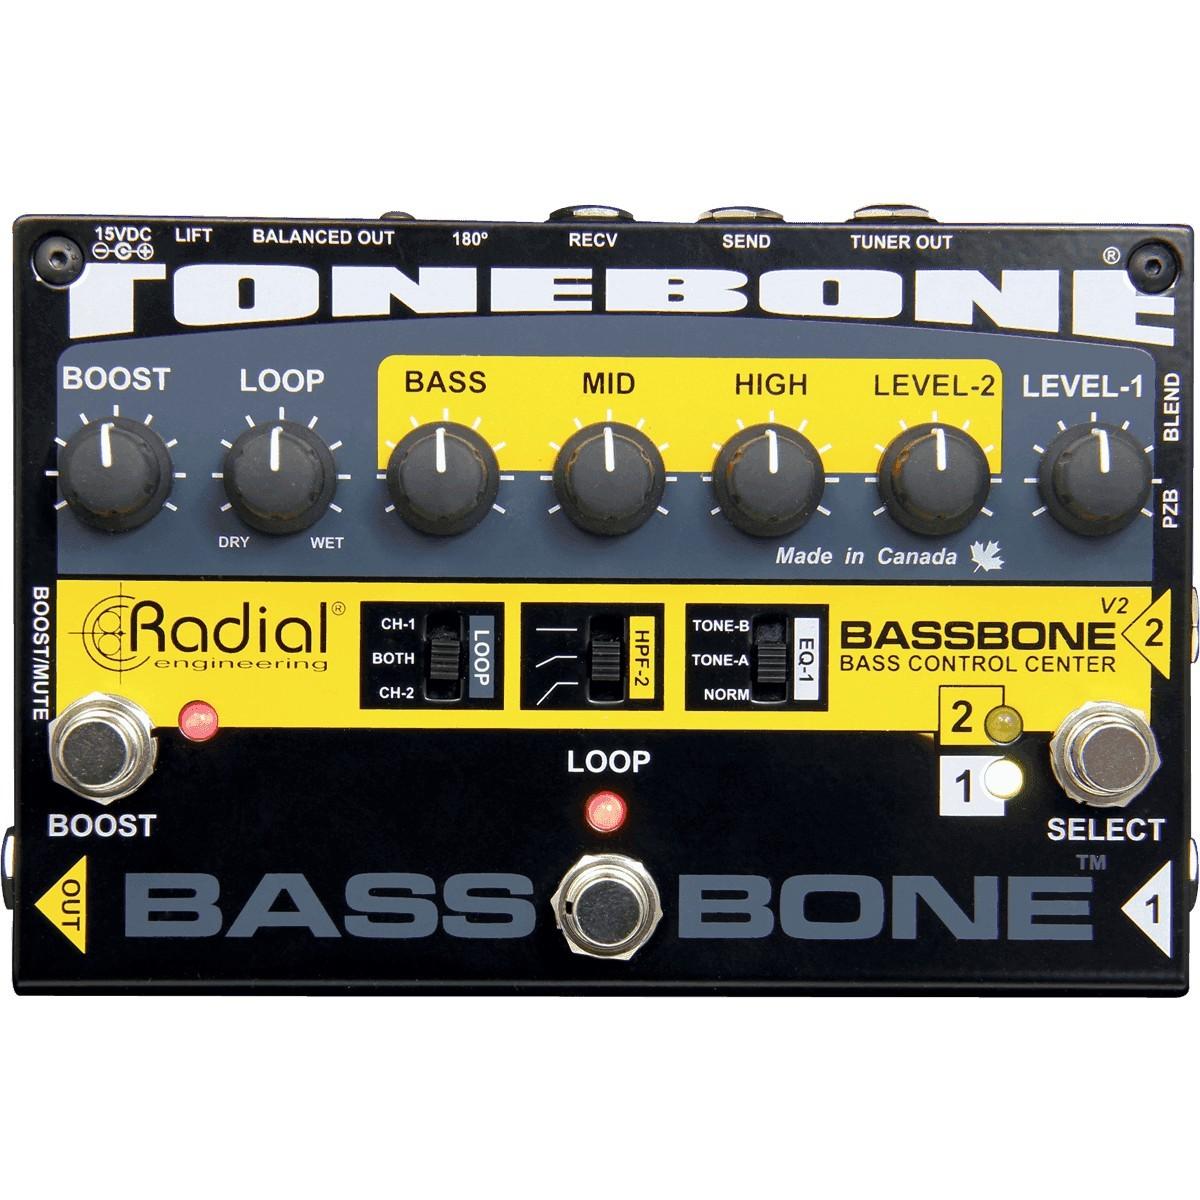 RADIAL ENGINEERING Tonebone Bassbone V2